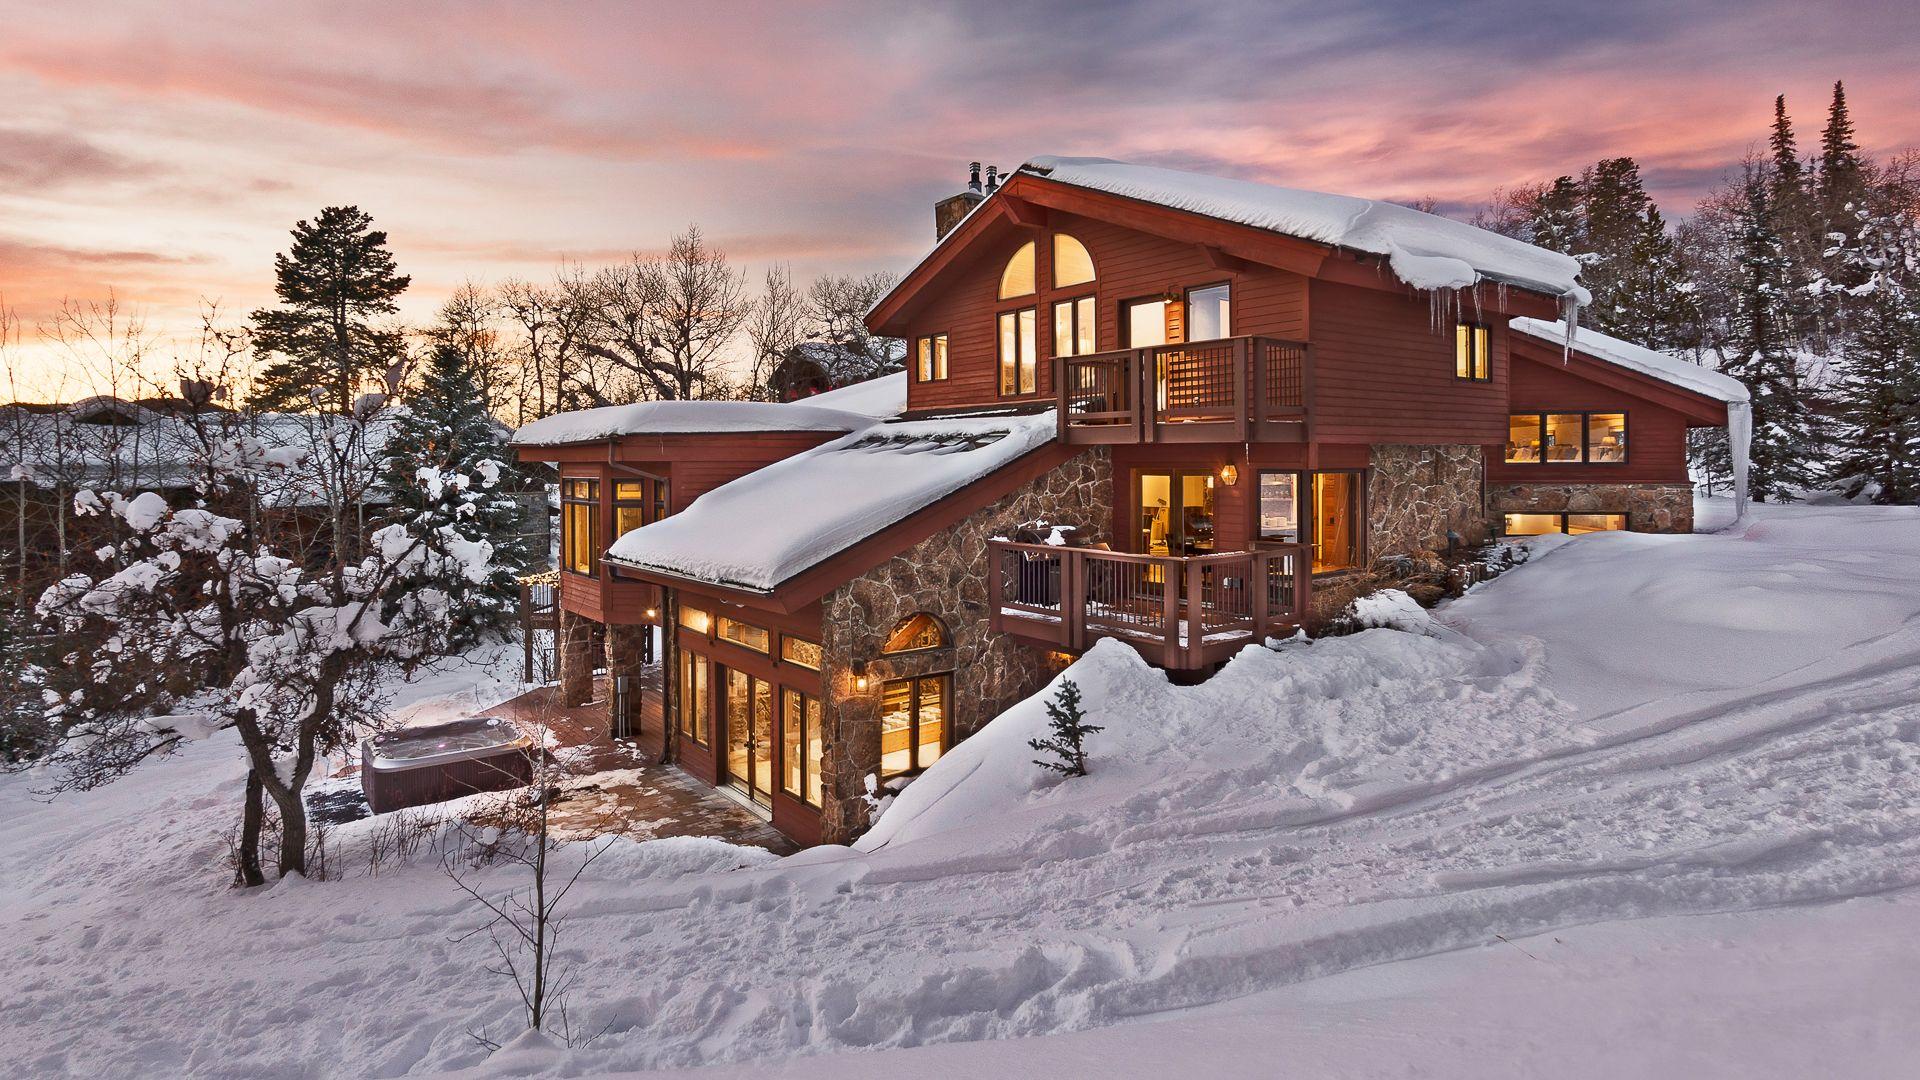 Image Result For Ski Lodge Exterior Steamboat Ski Resort Steamboat Springs Mountain Dream Homes